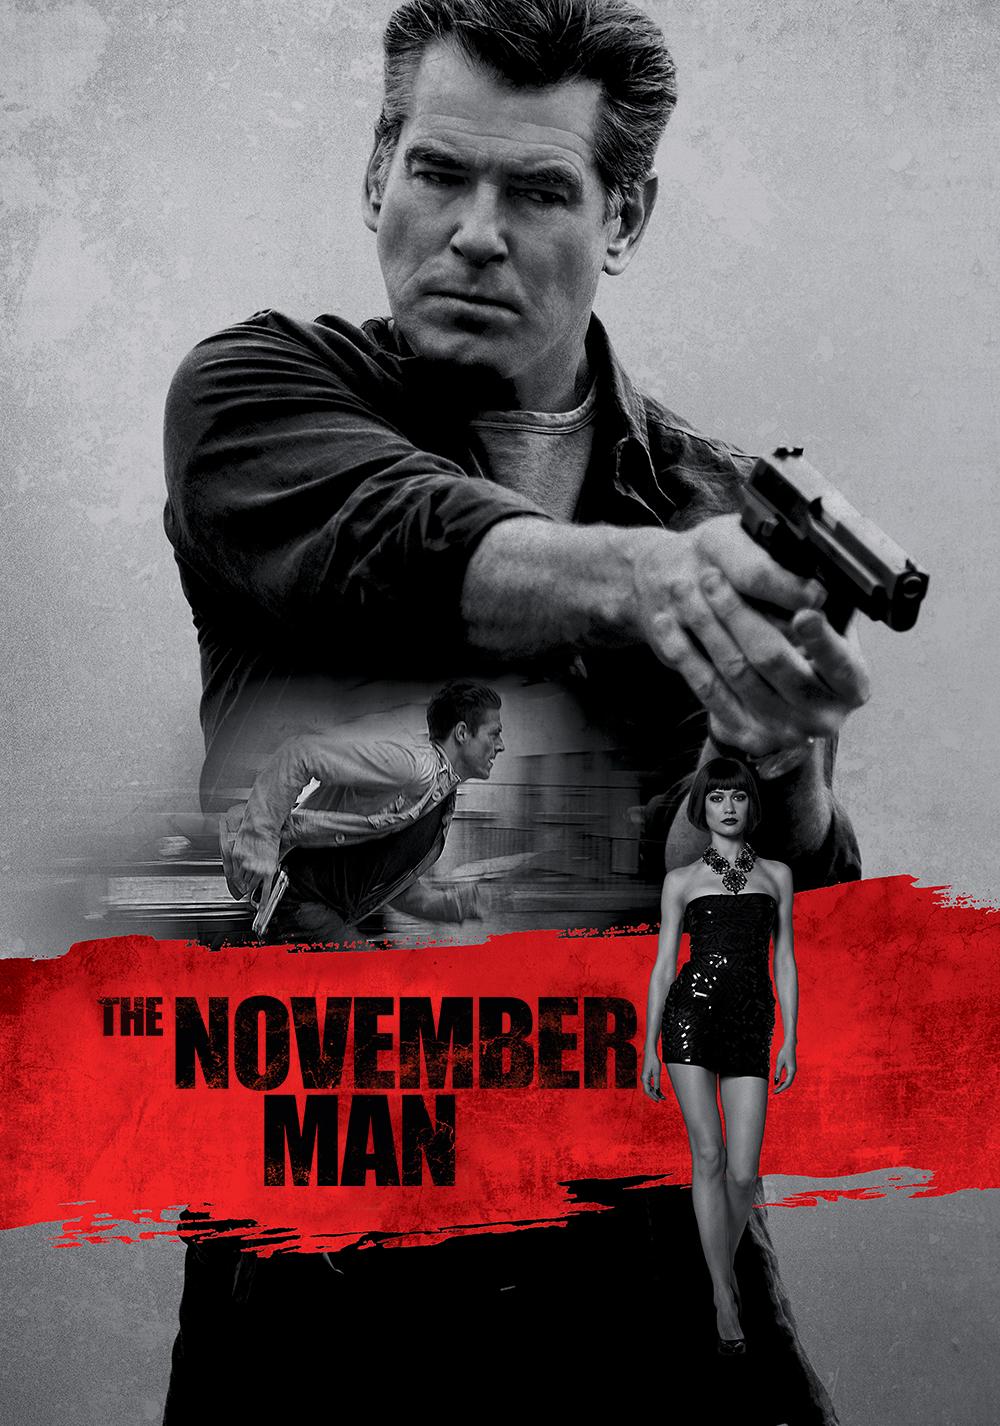 THE NOVEMBER MAN (2014) TAMIL DUBBED HD